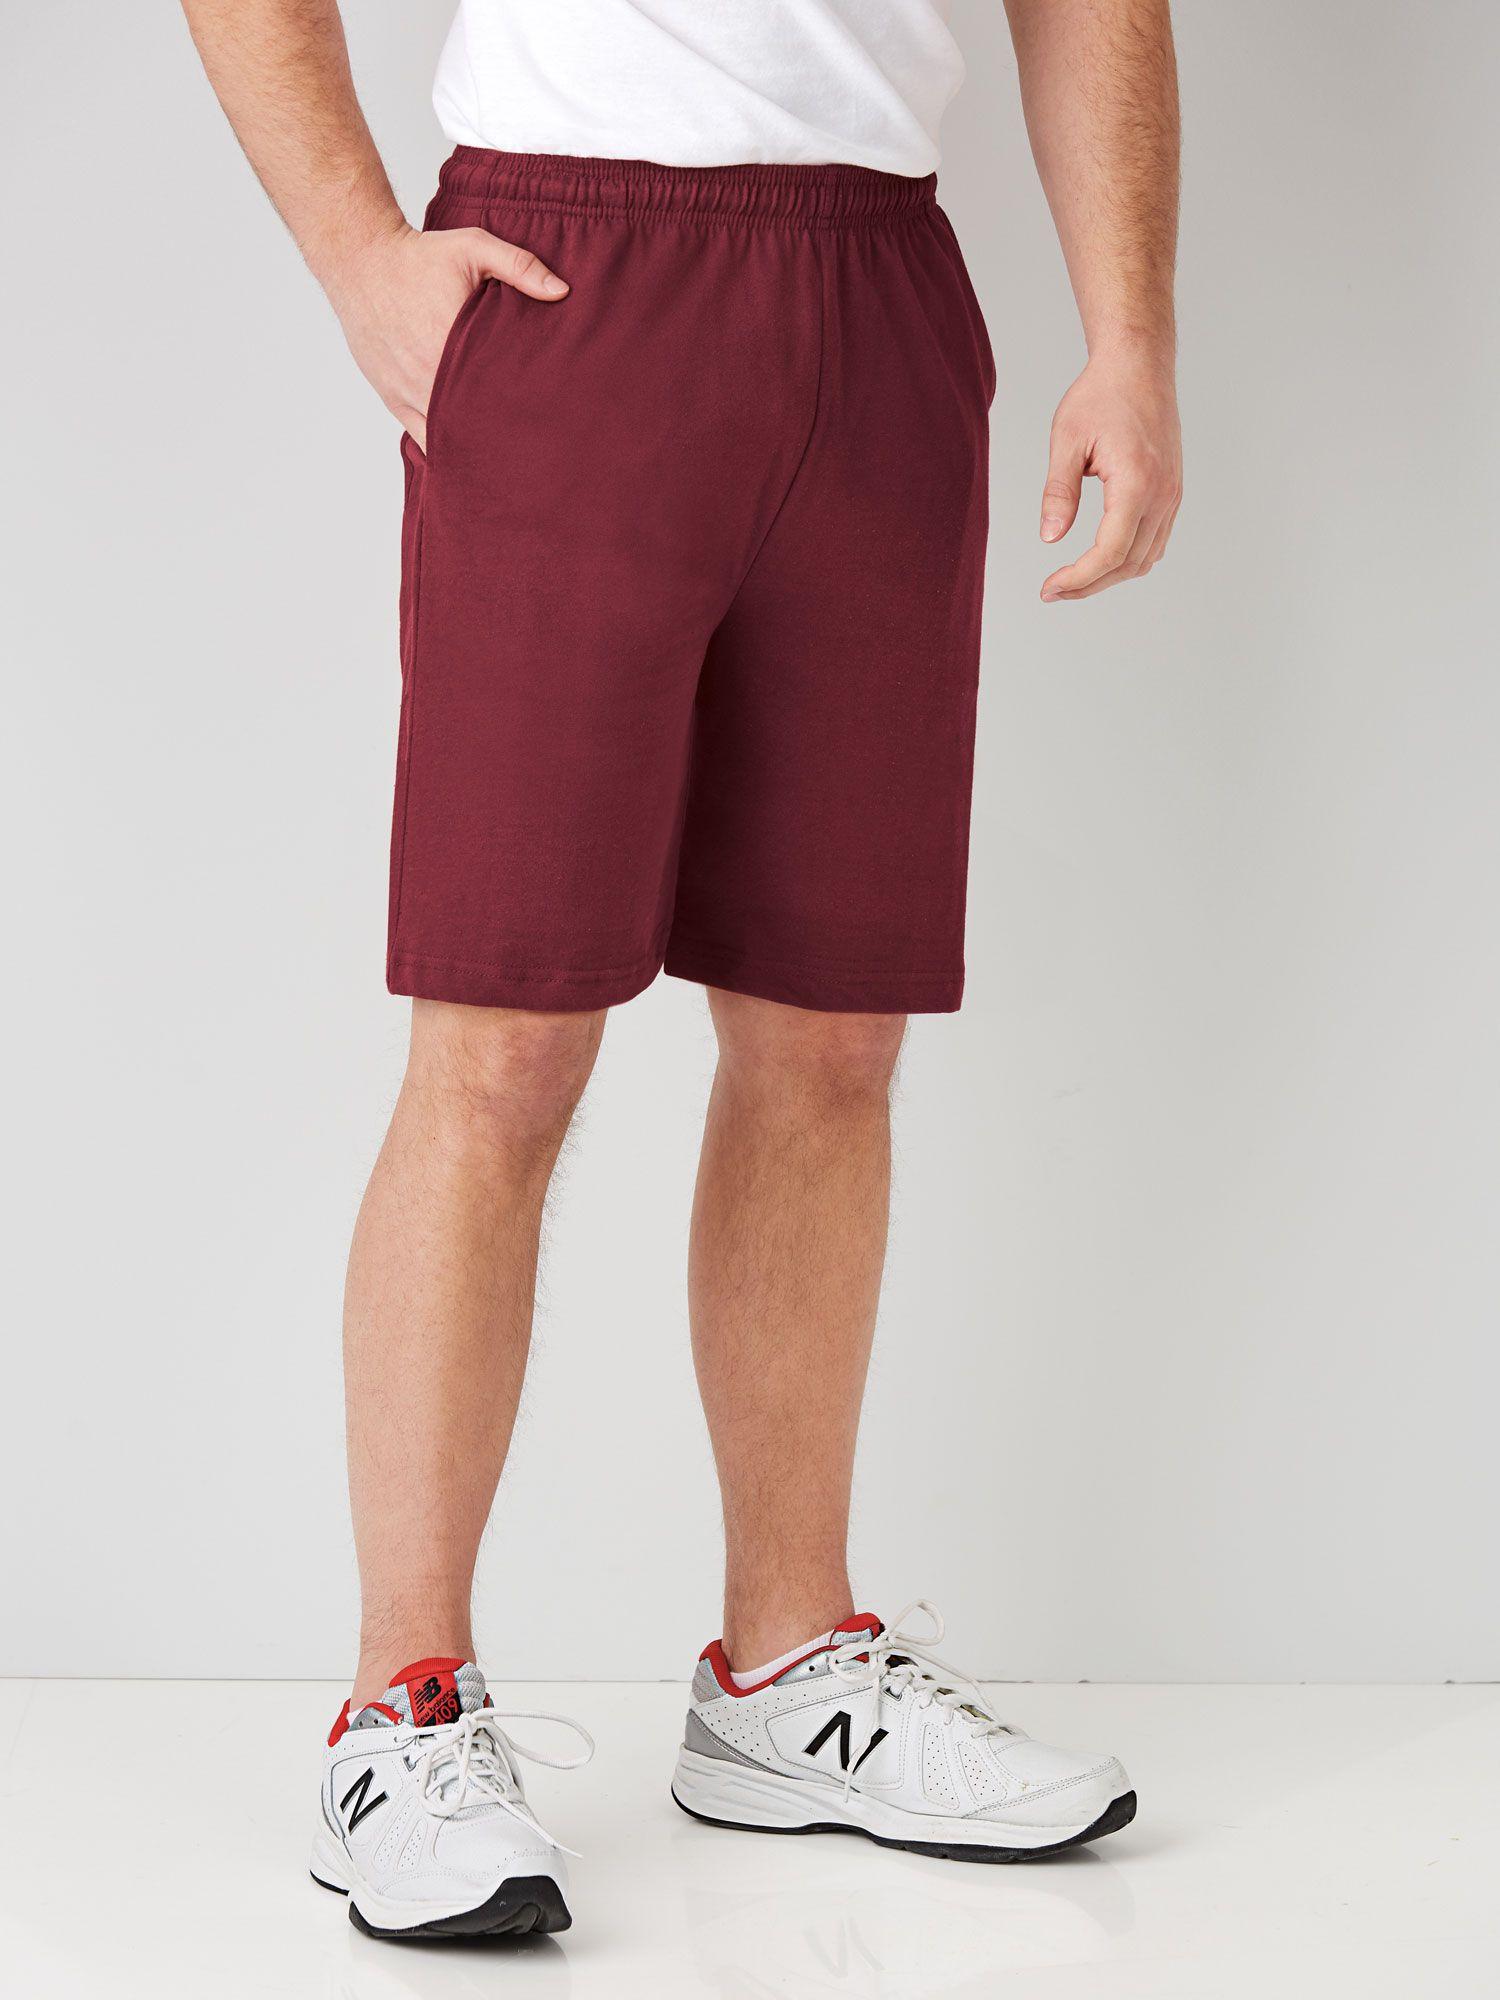 low price sale fantastic savings top-rated original Active Joe® Lounge Shorts